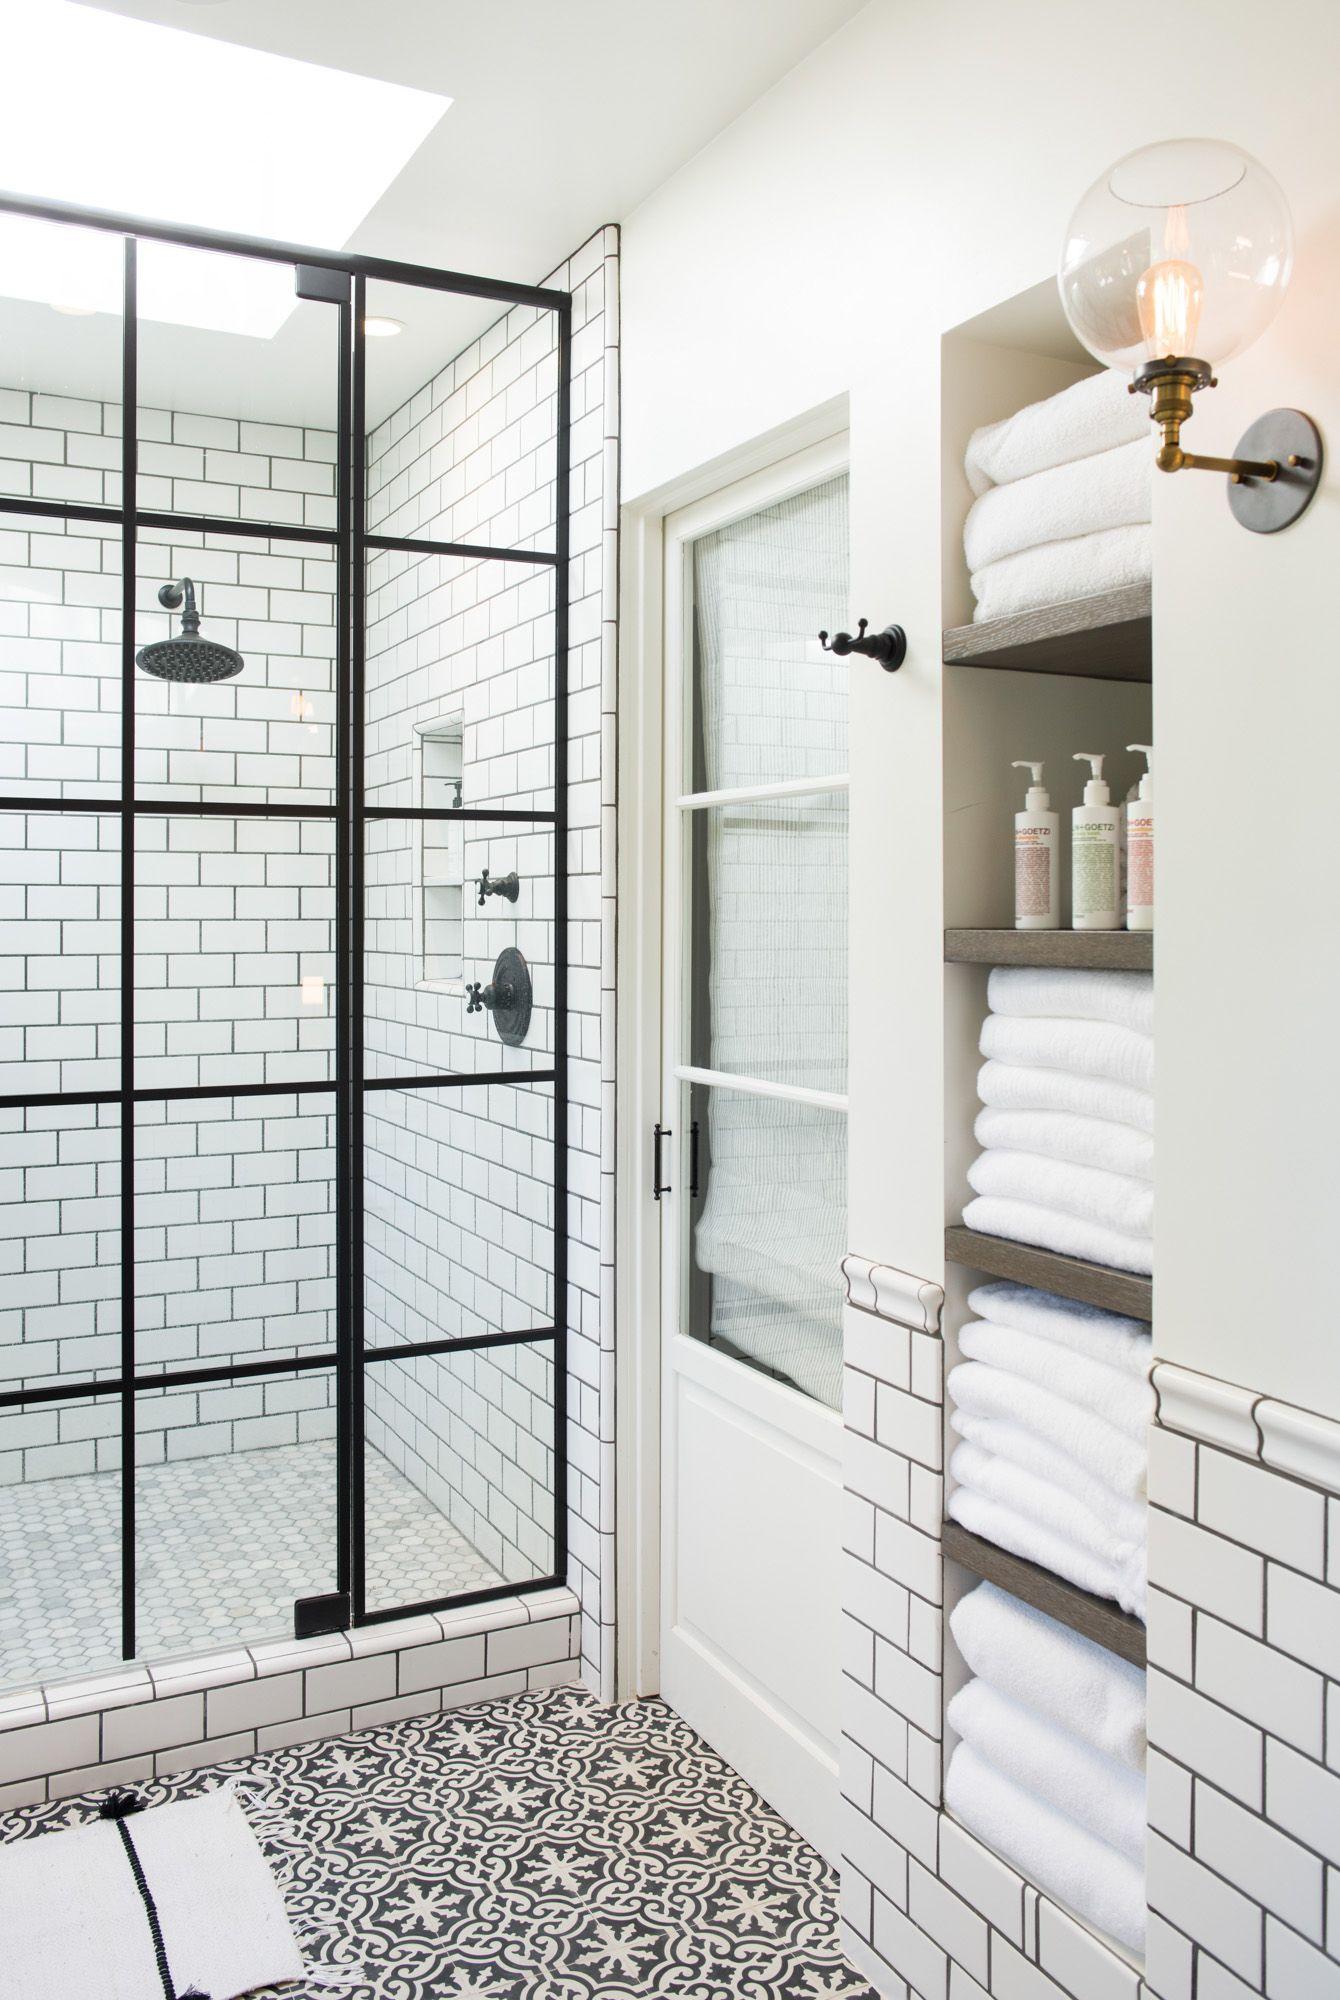 Pin by Rebecca Eisemann on Bathroom Inspiration | Pinterest | Bath ...